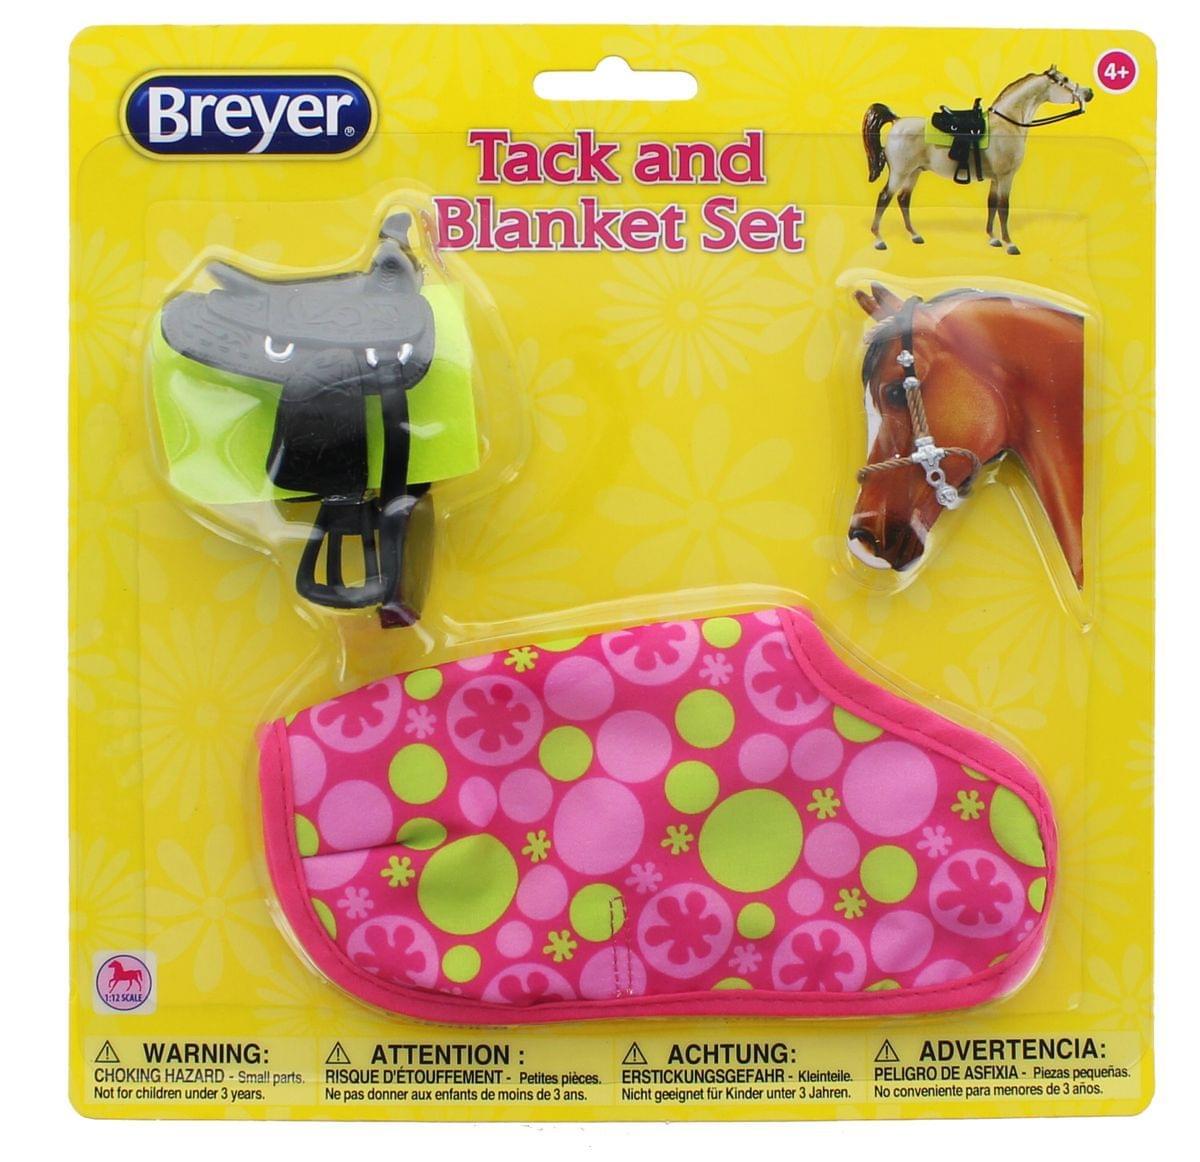 Breyer 1:12 Classic Model Horse Tack and Blanket Set, Pink & Green